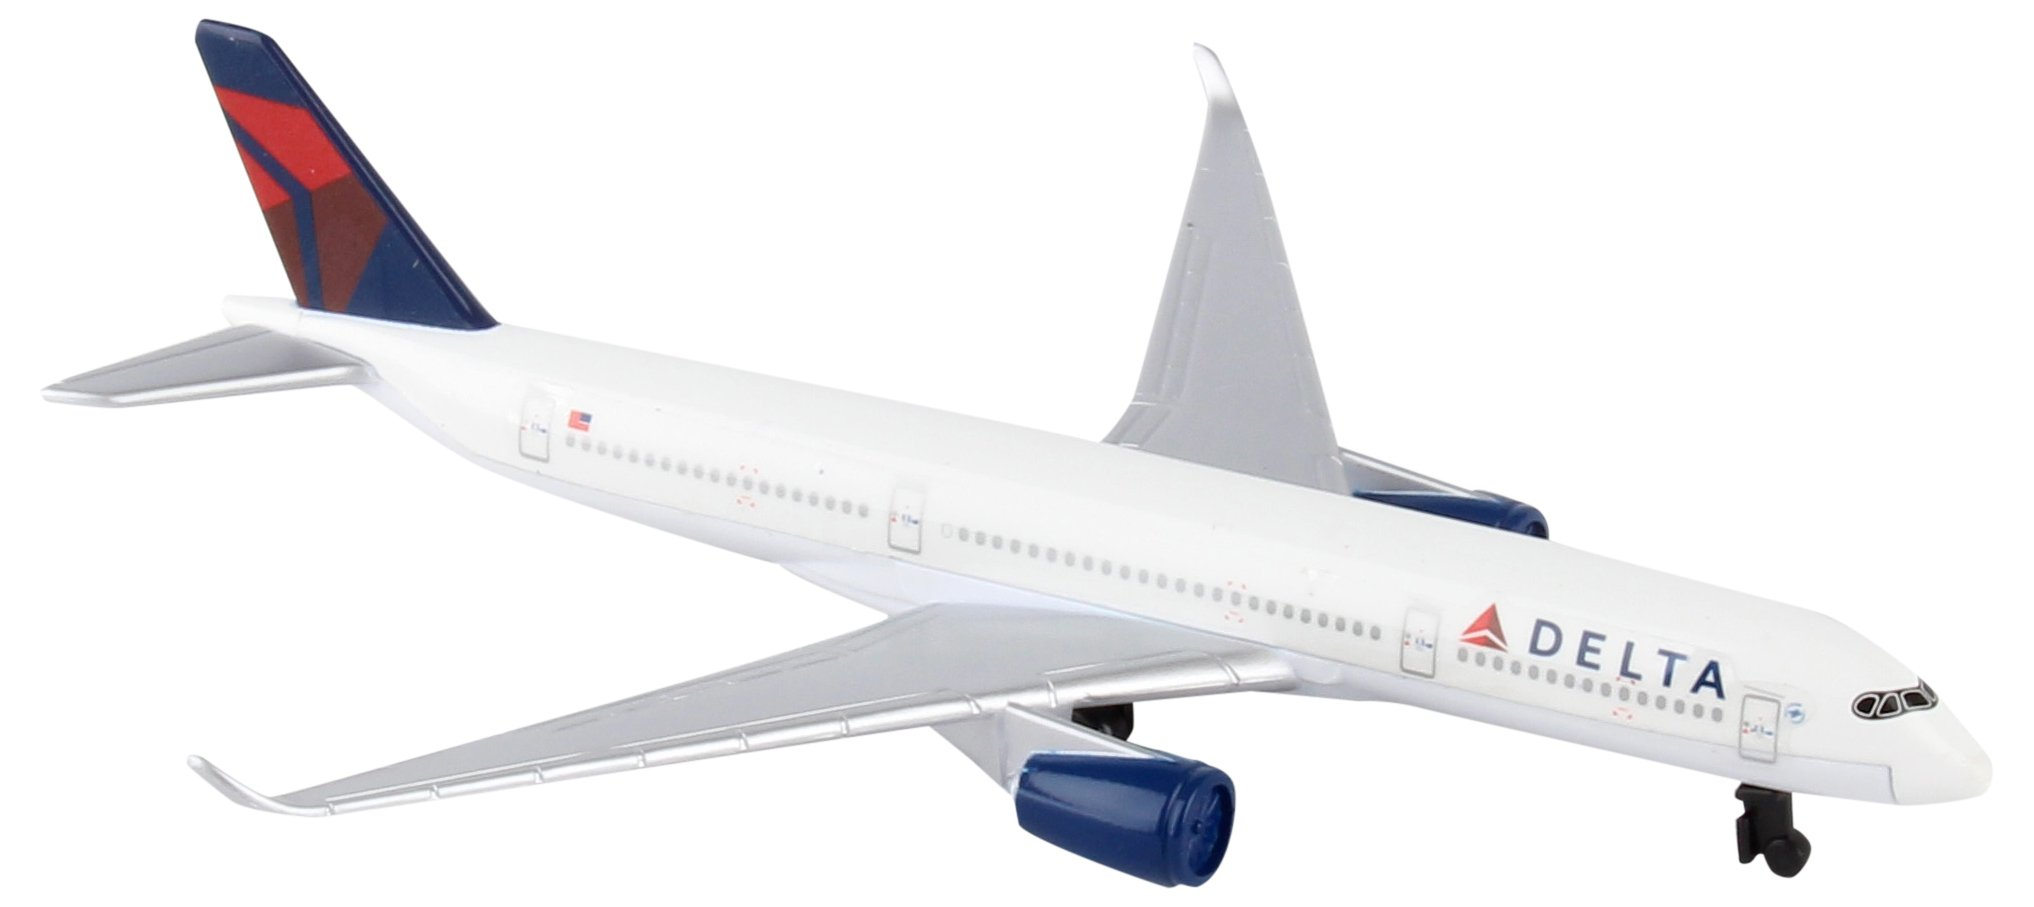 Buy Delta Airline Now!